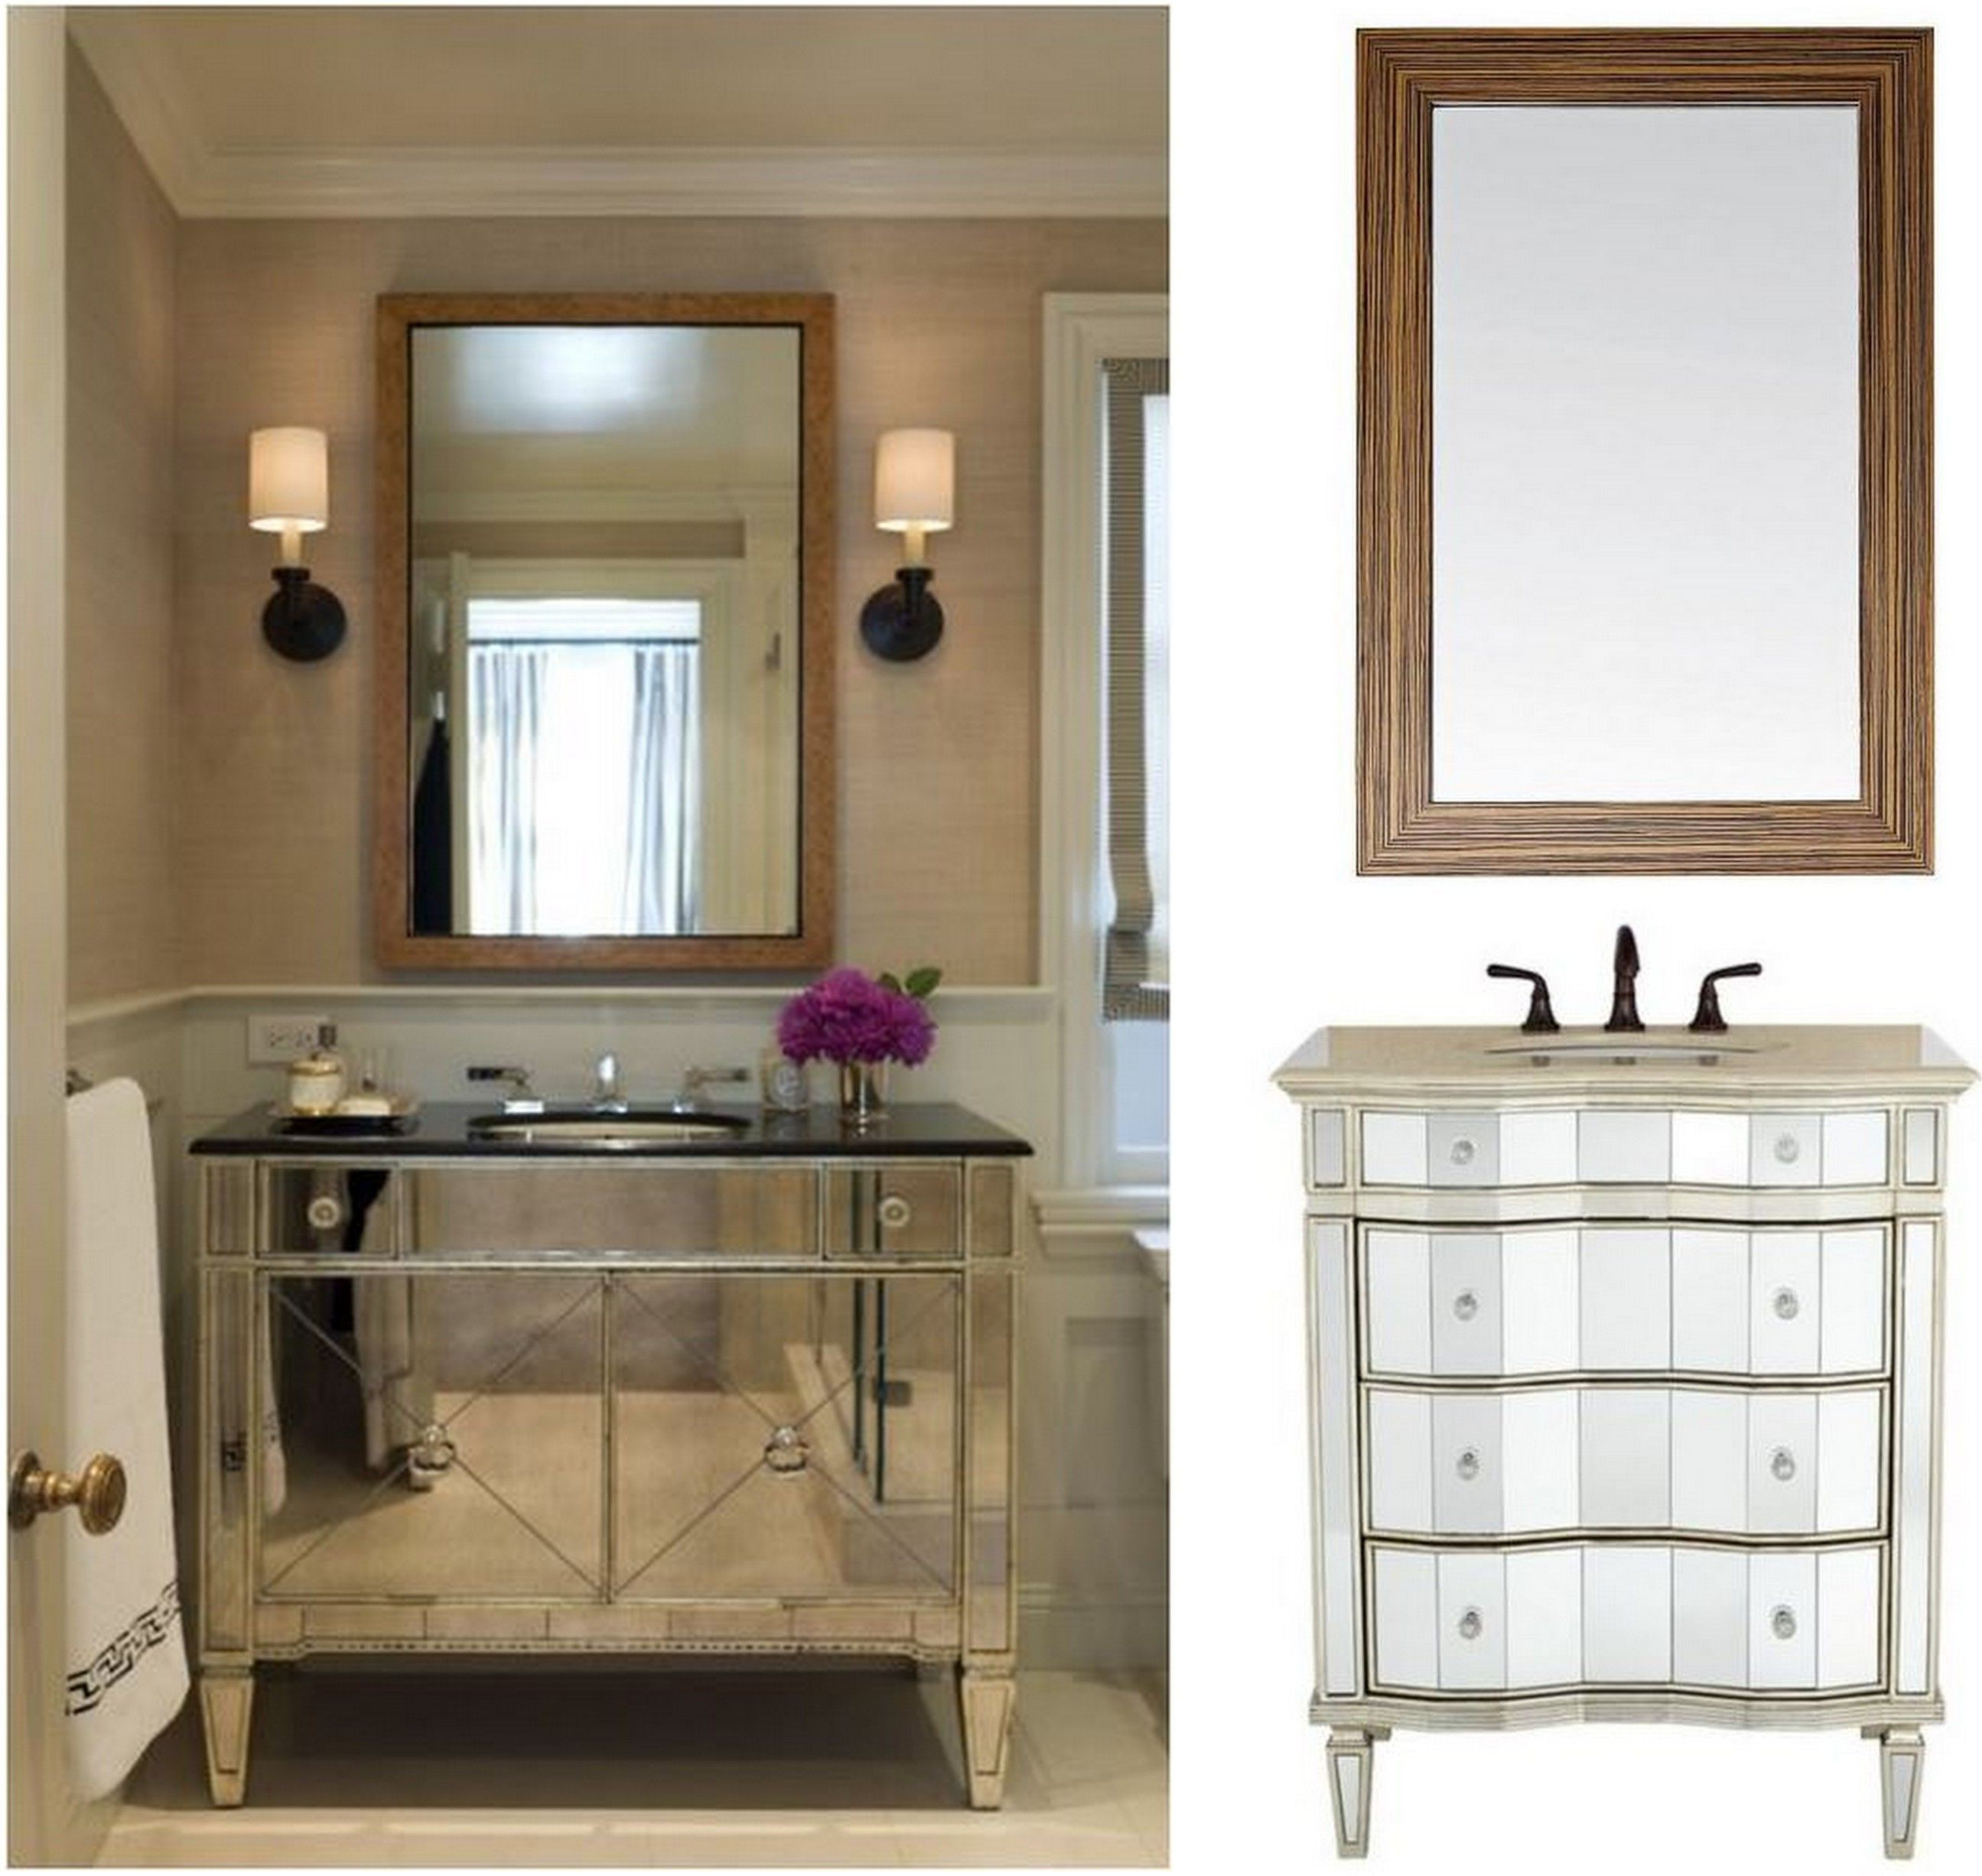 20 Stunning Glam Powder Room Ideas Farmhouse Style Bathroom Vanity Small Bathroom Vanities Bathroom Mirror